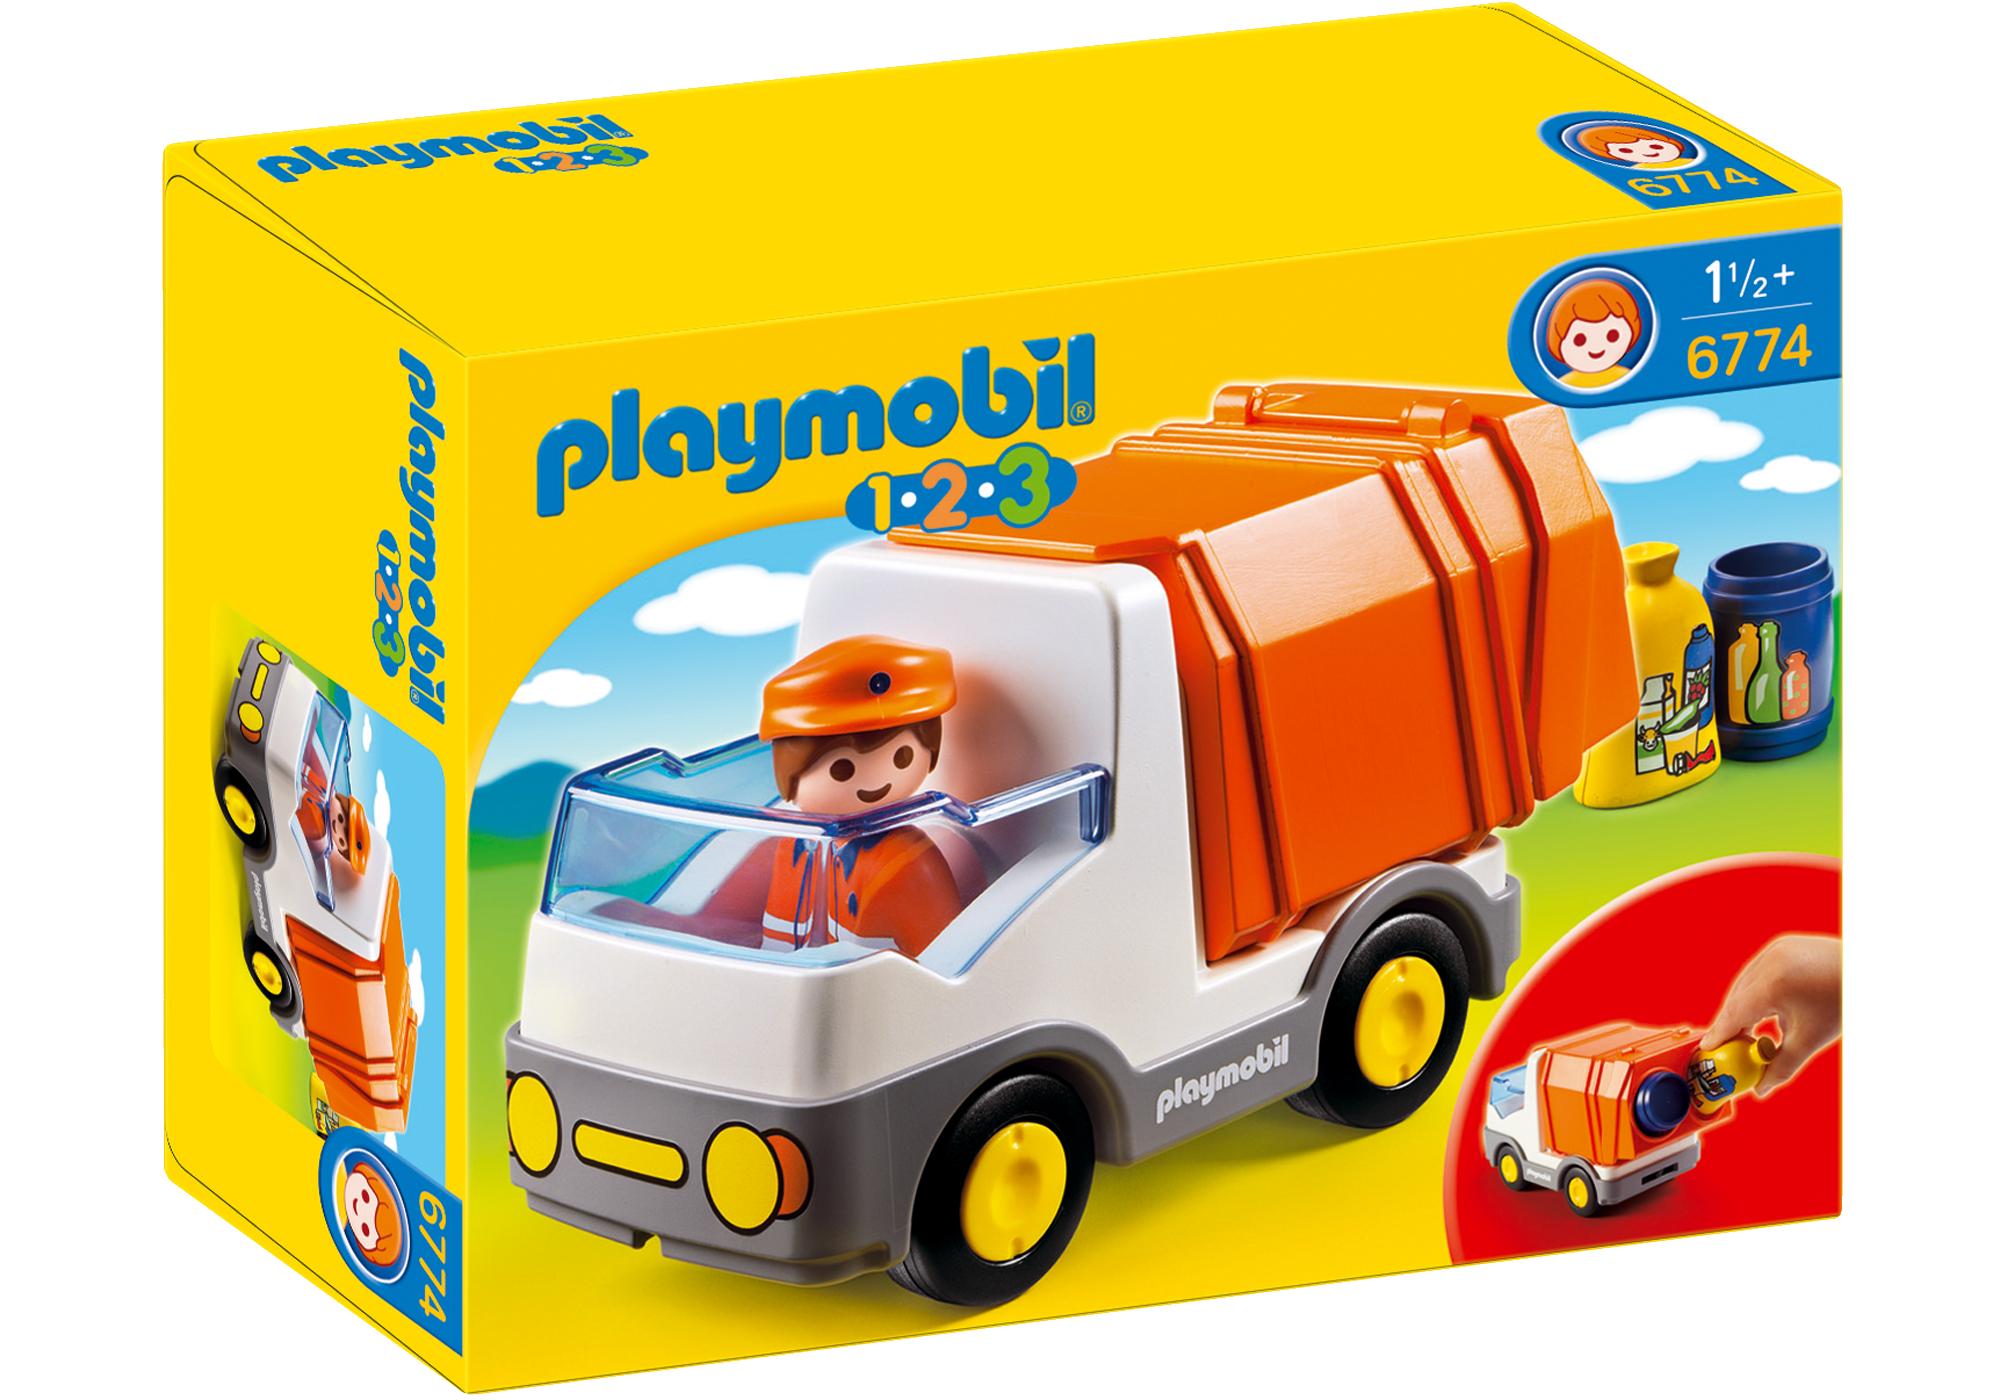 http://media.playmobil.com/i/playmobil/6774_product_box_front/1.2.3 Recycling Truck